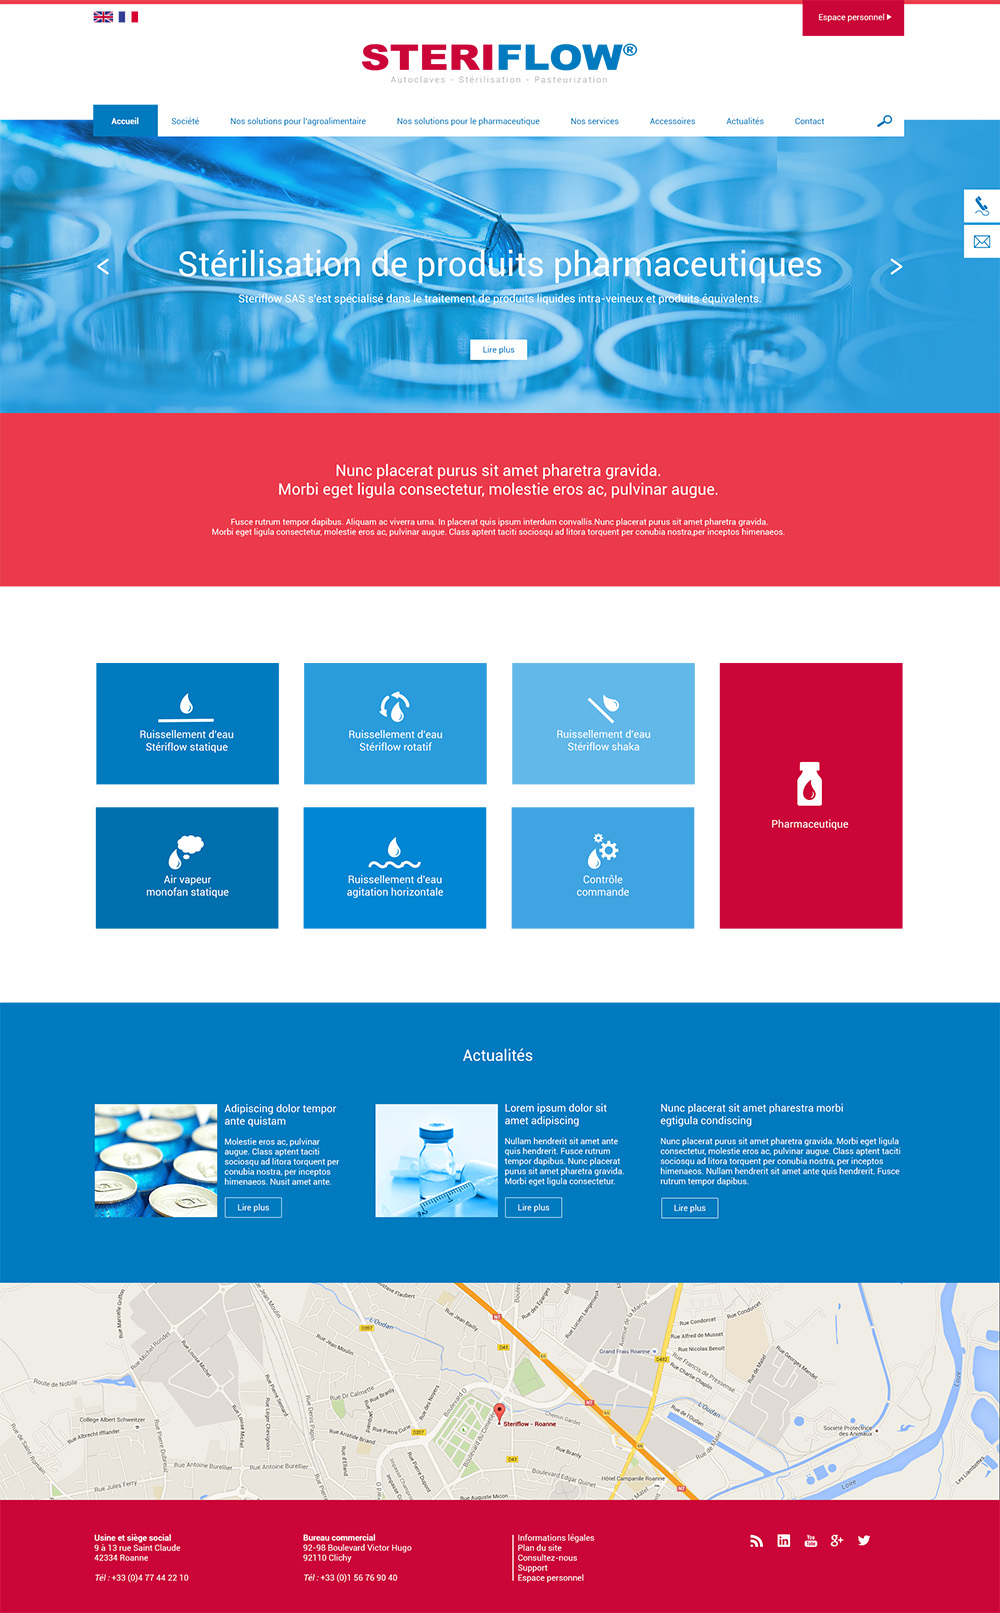 byedel_webdesign_actioncom_steriflow1